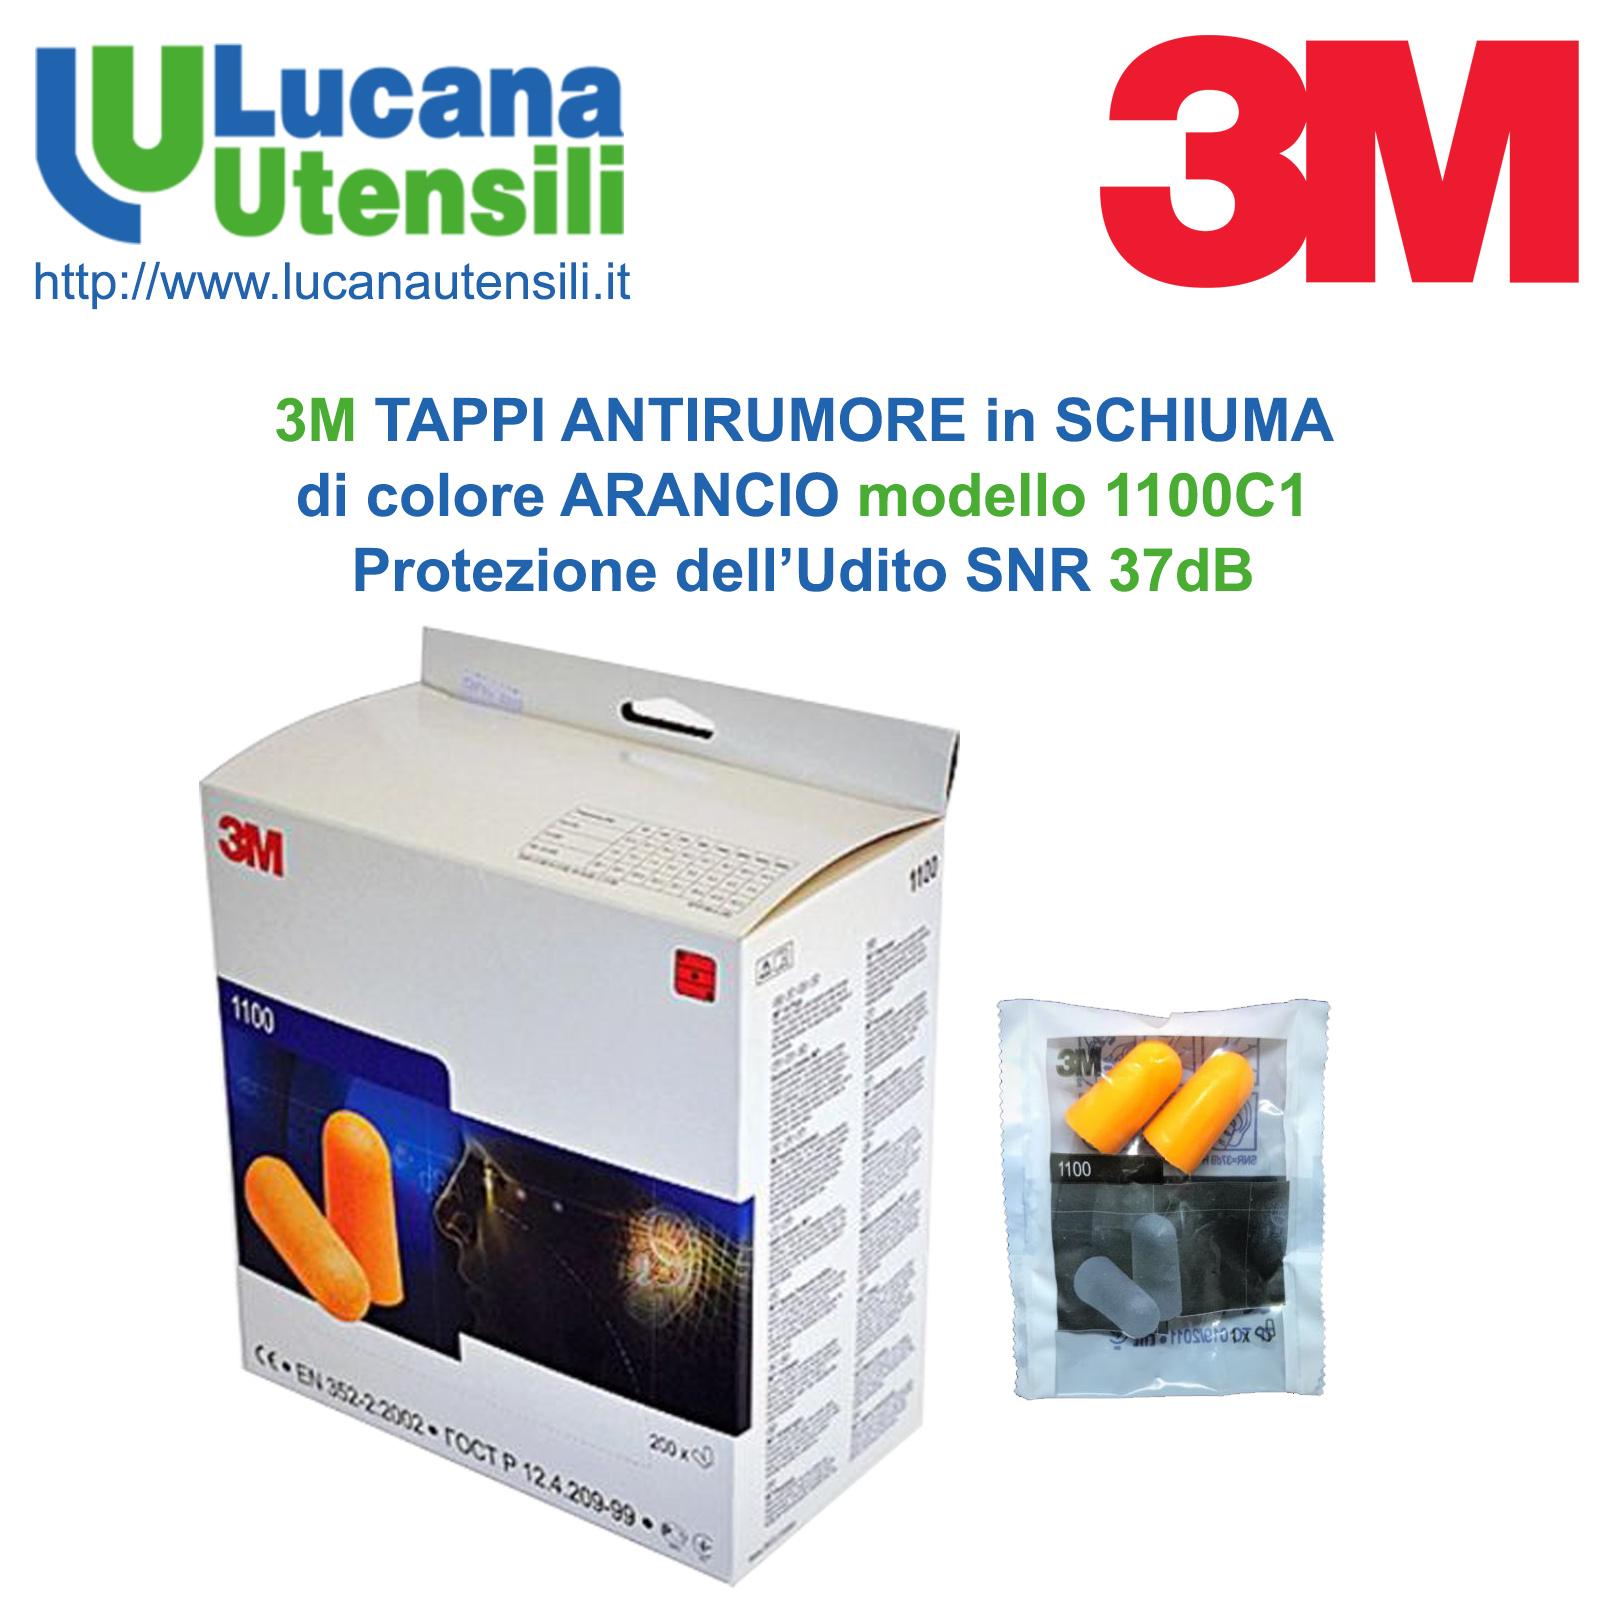 Arancione 3M 1100 Tappi Auricolari Set da 5 Pezzi